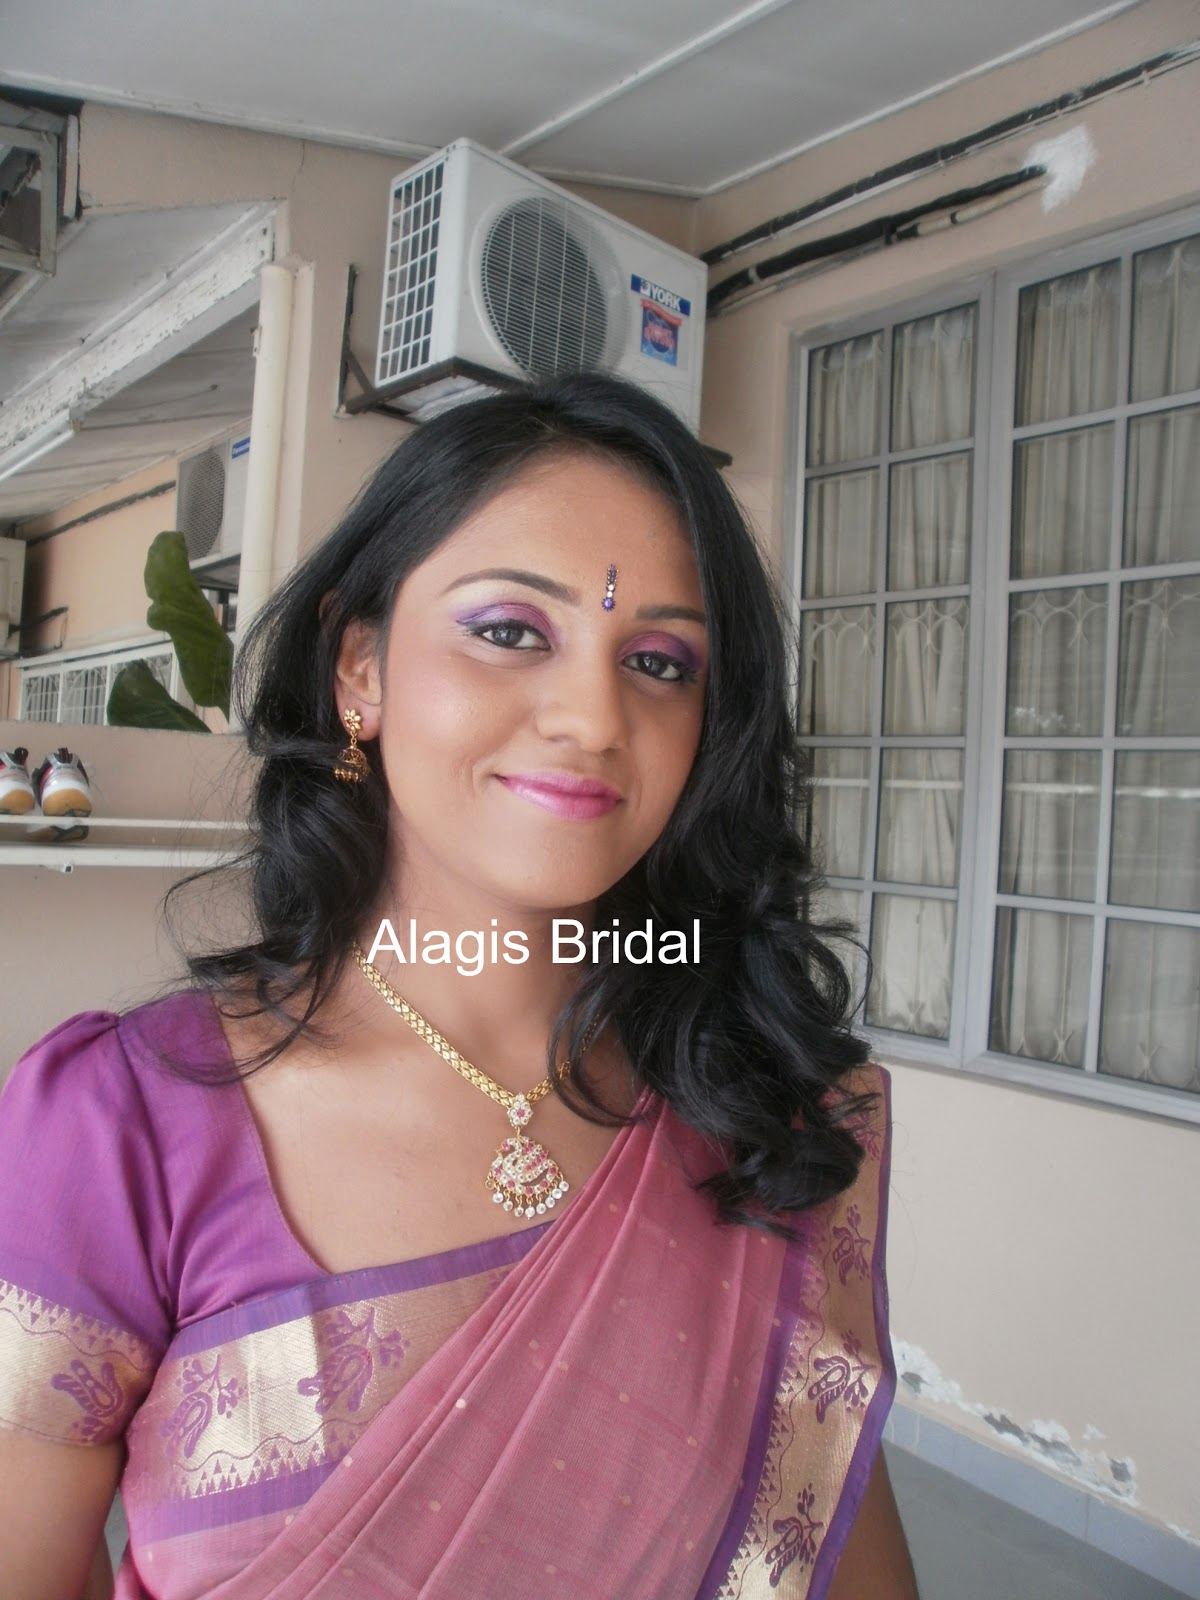 Alagis Bridal http://www.alagisbridalbeauty.com/2010/10/makeup-for